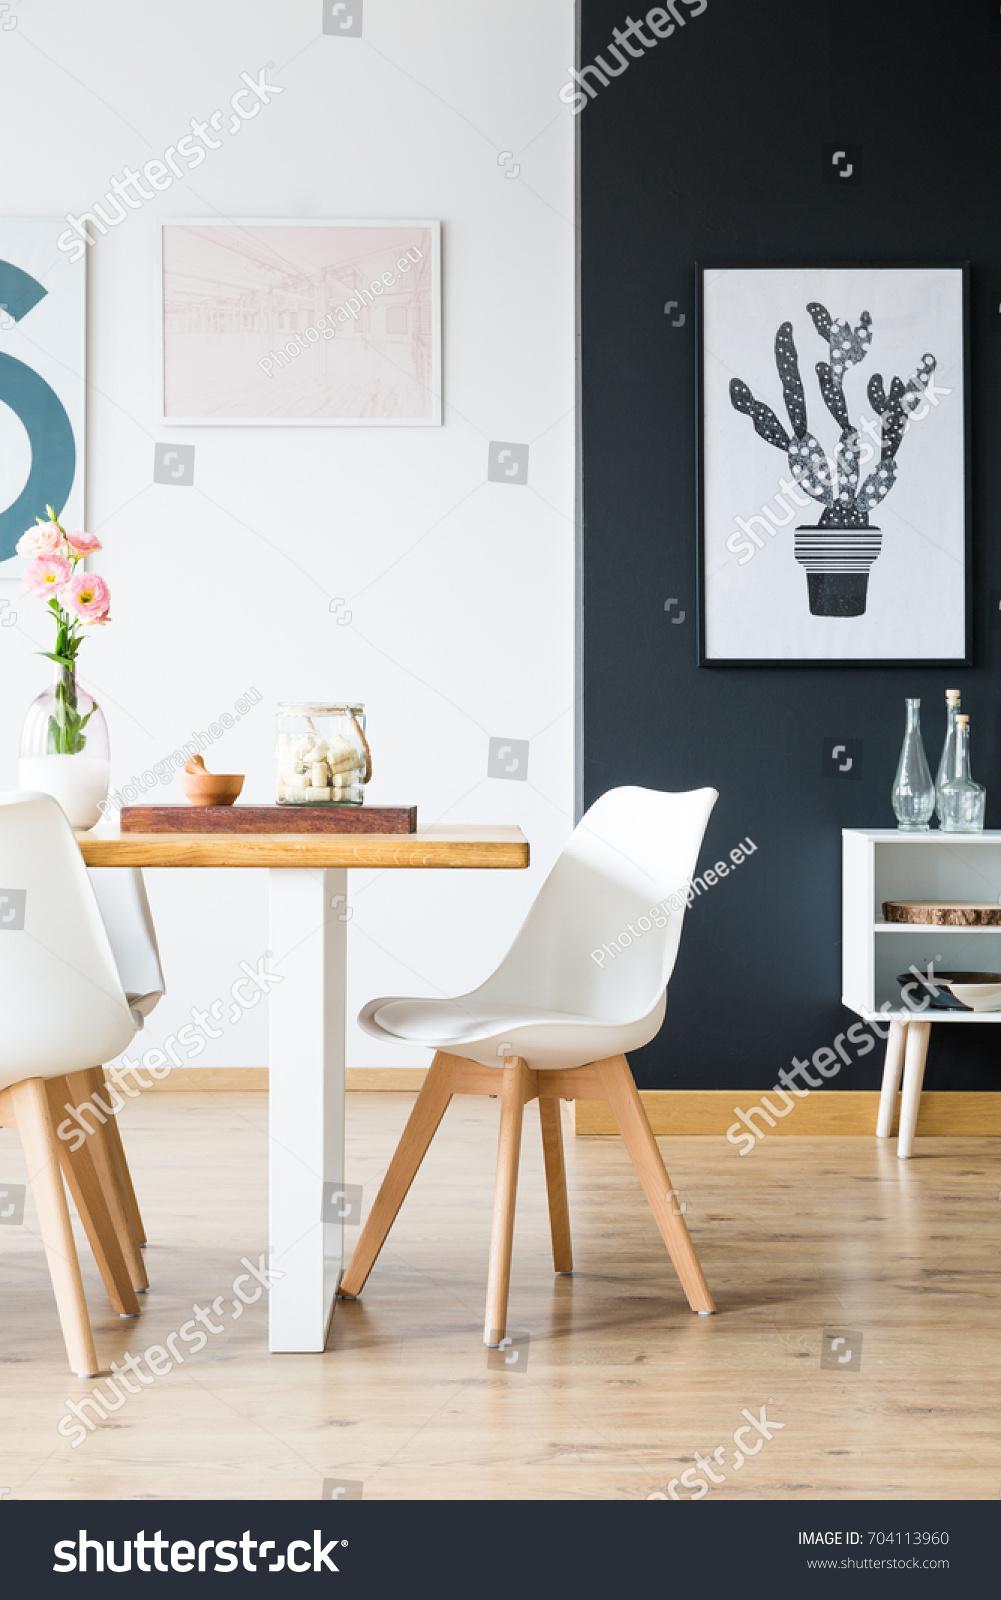 Modern Minimal Home Interior Design Scandi Stock Photo (Royalty Free ...